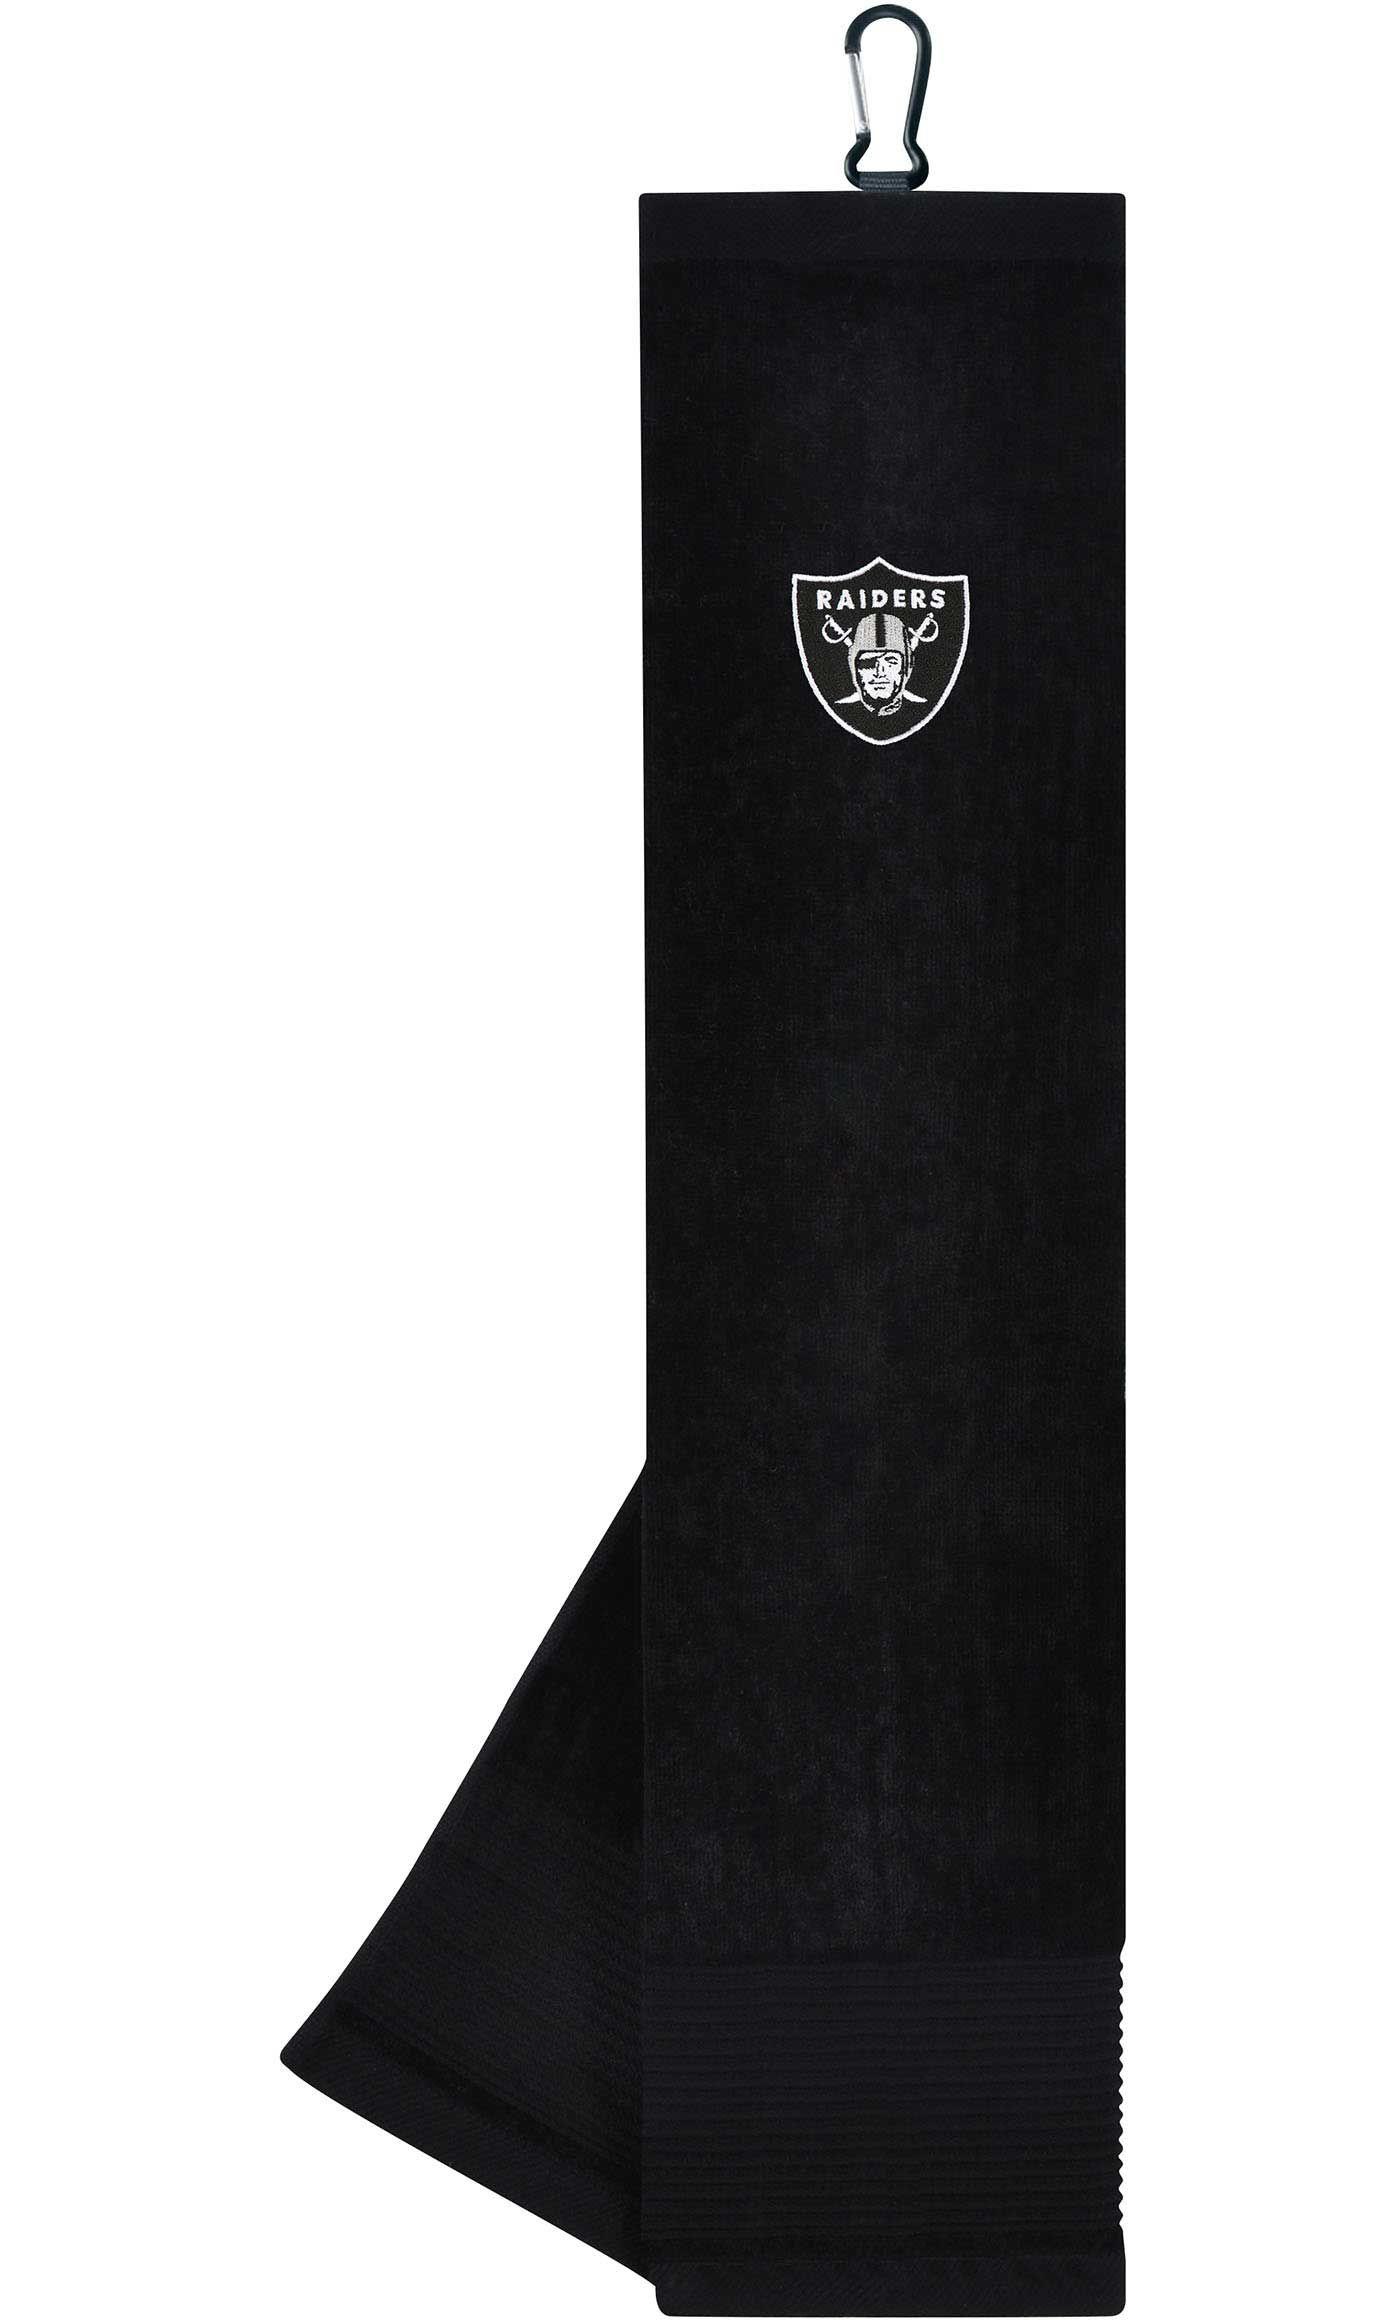 Team Effort Oakland Raiders Embroidered Face/Club Tri-Fold Towel